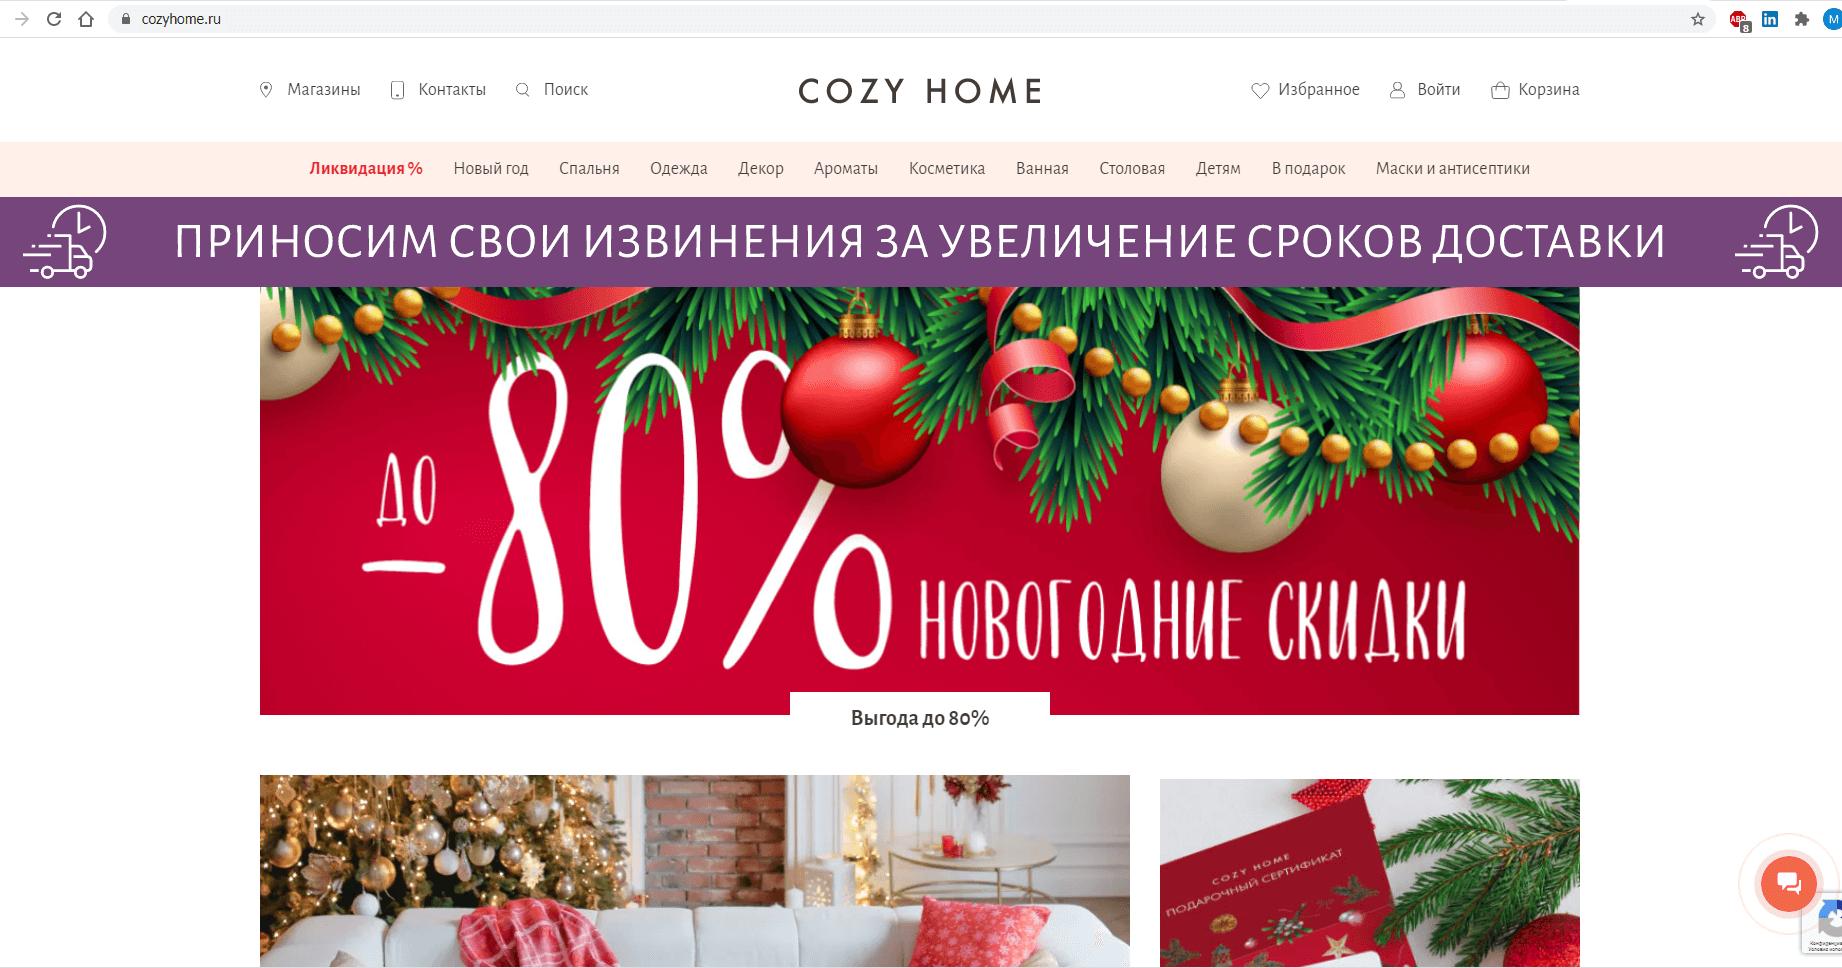 cozyhome.ru website